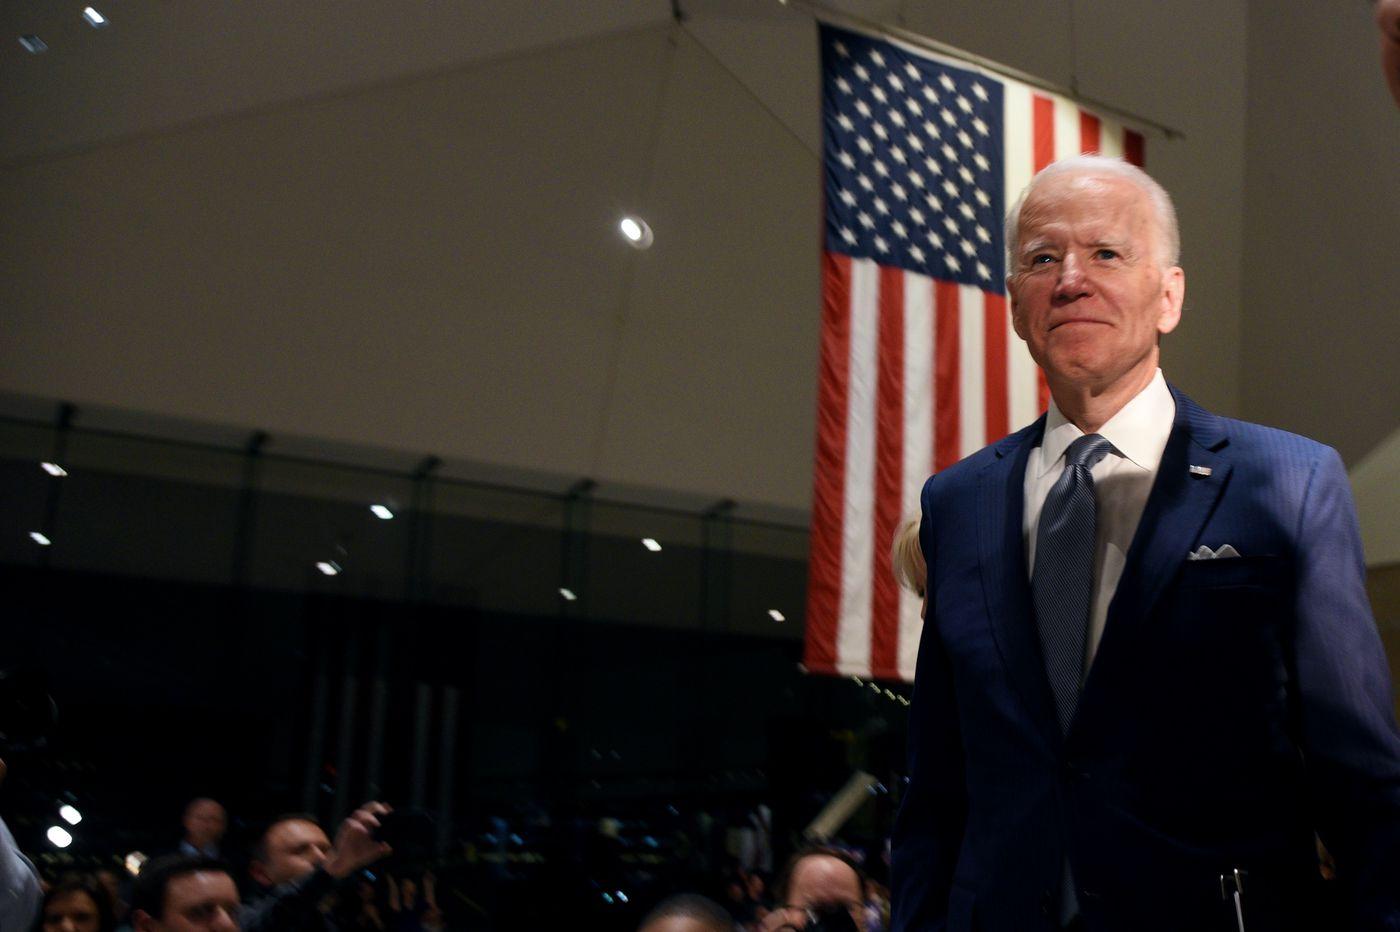 Joe Biden's domination in Michigan shows Democrats how to win Pennsylvania in 2020